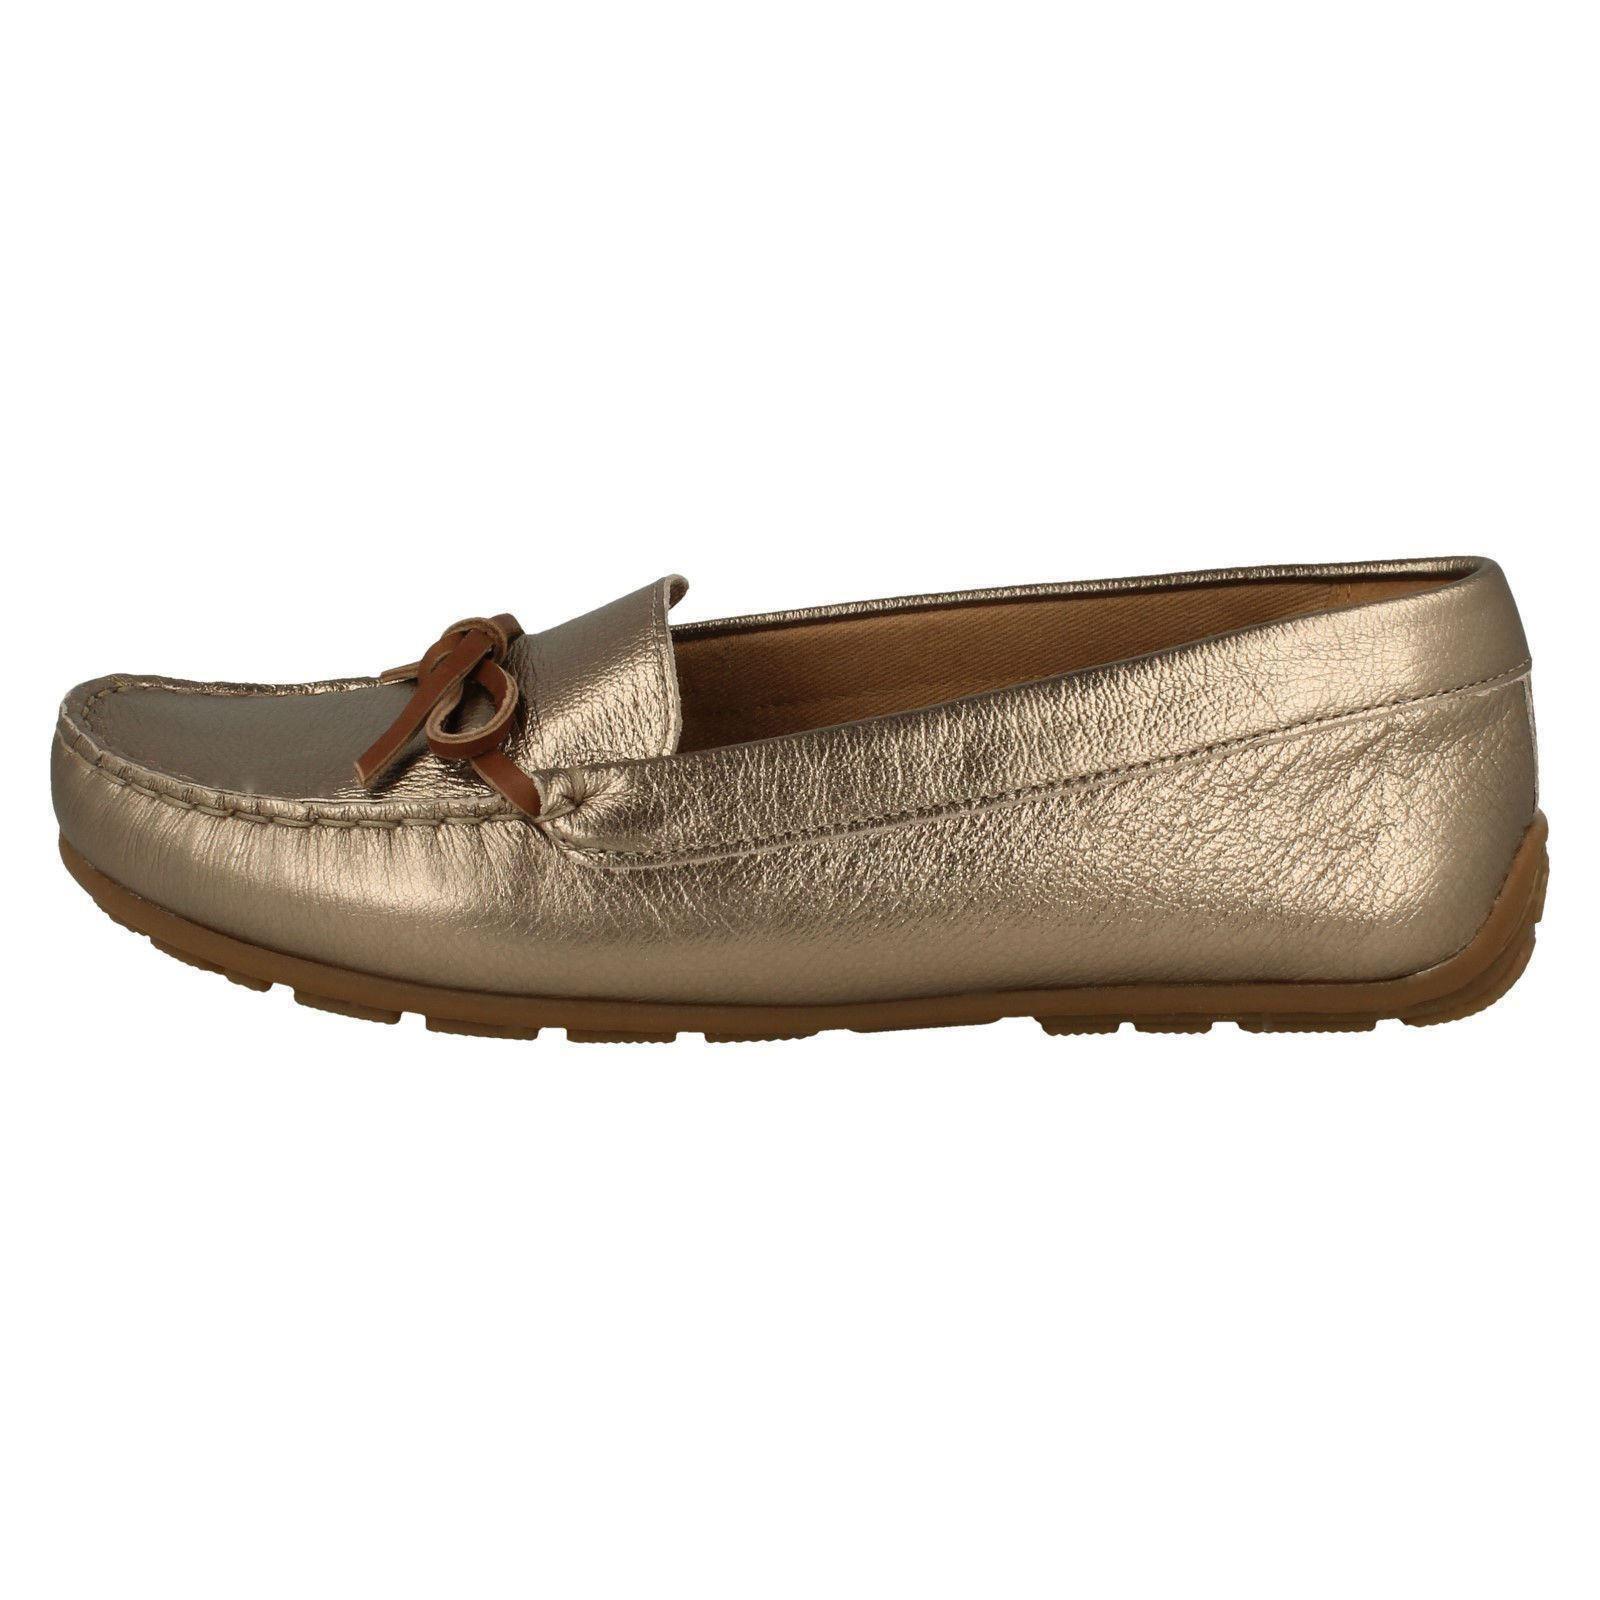 Details zu Damen Clarks Mokassin Stil Schuhe Dameo Swing